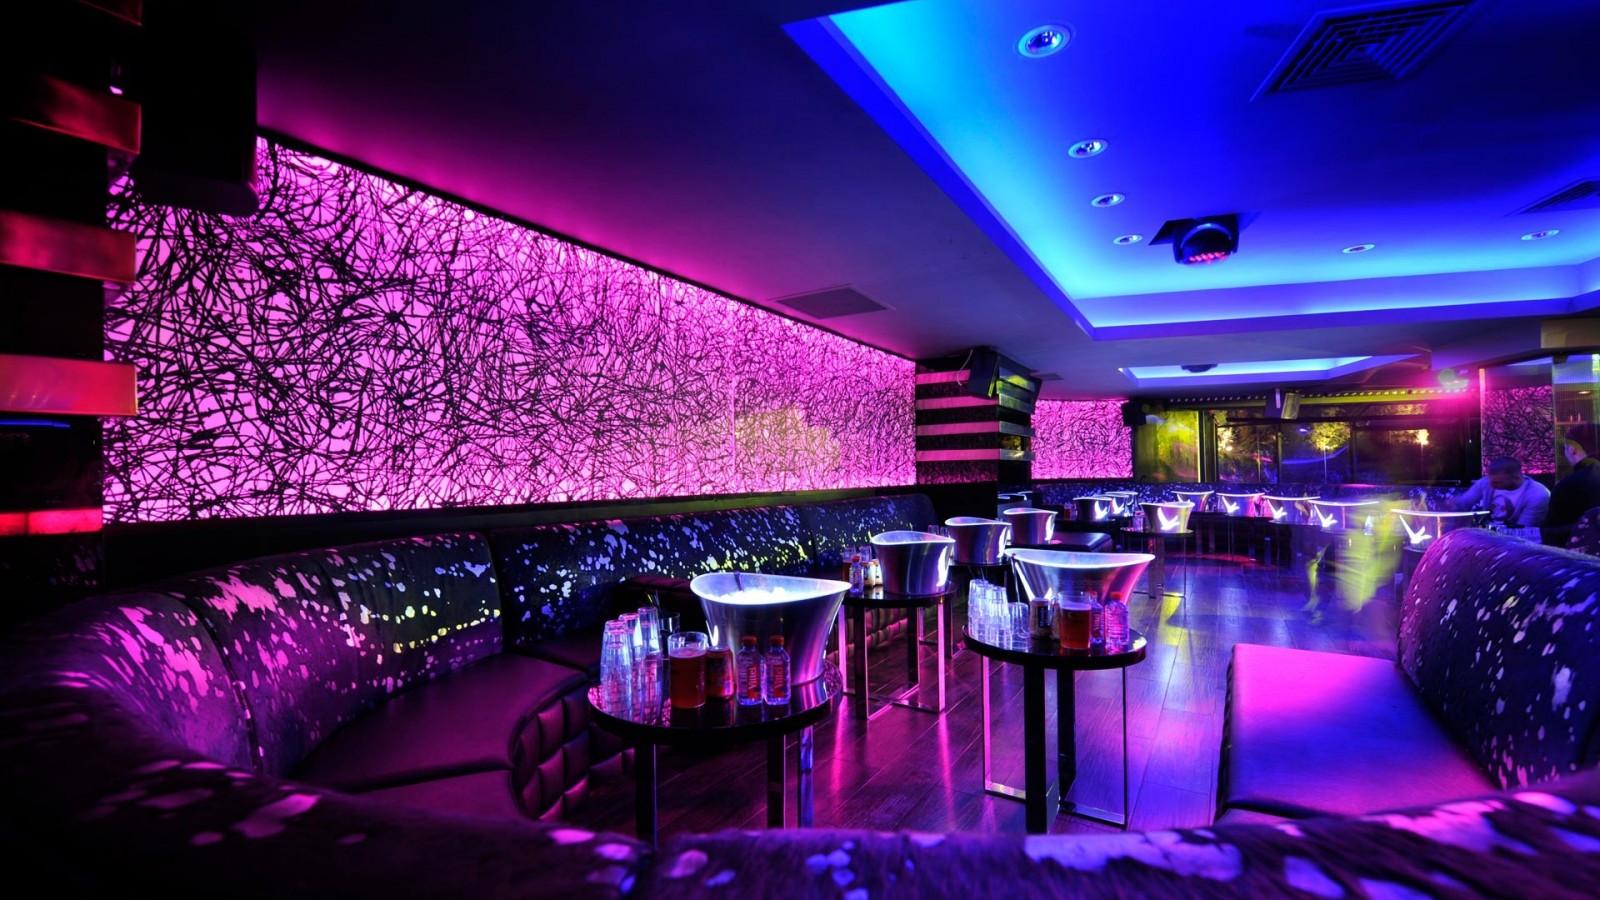 Una salida entre amigos - Página 3 Design_bar_lighting_night_club_neon_lights_by_chaoaangelmoon-d8kzo39